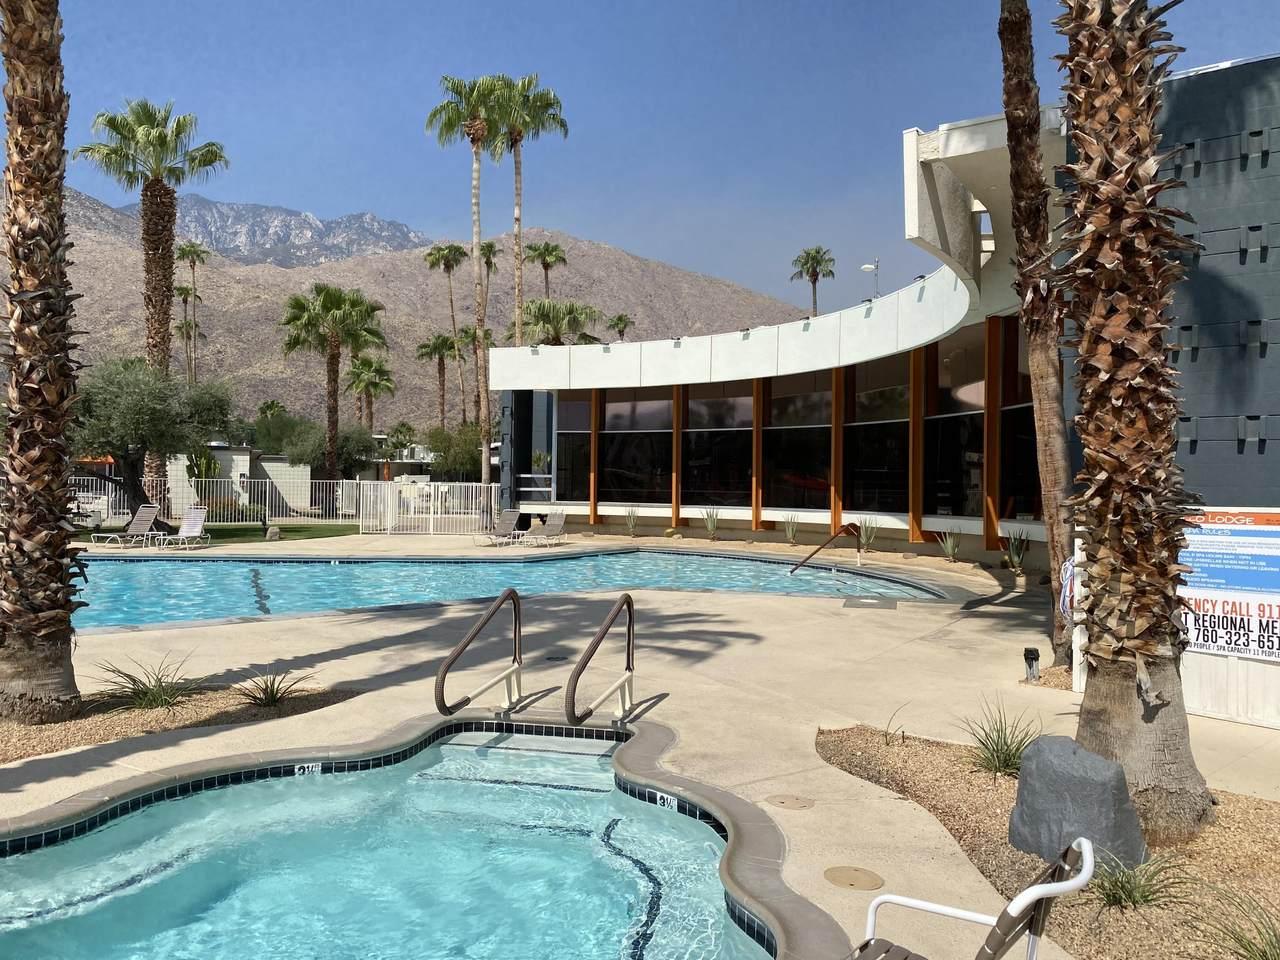 1111 Palm Canyon Drive - Photo 1